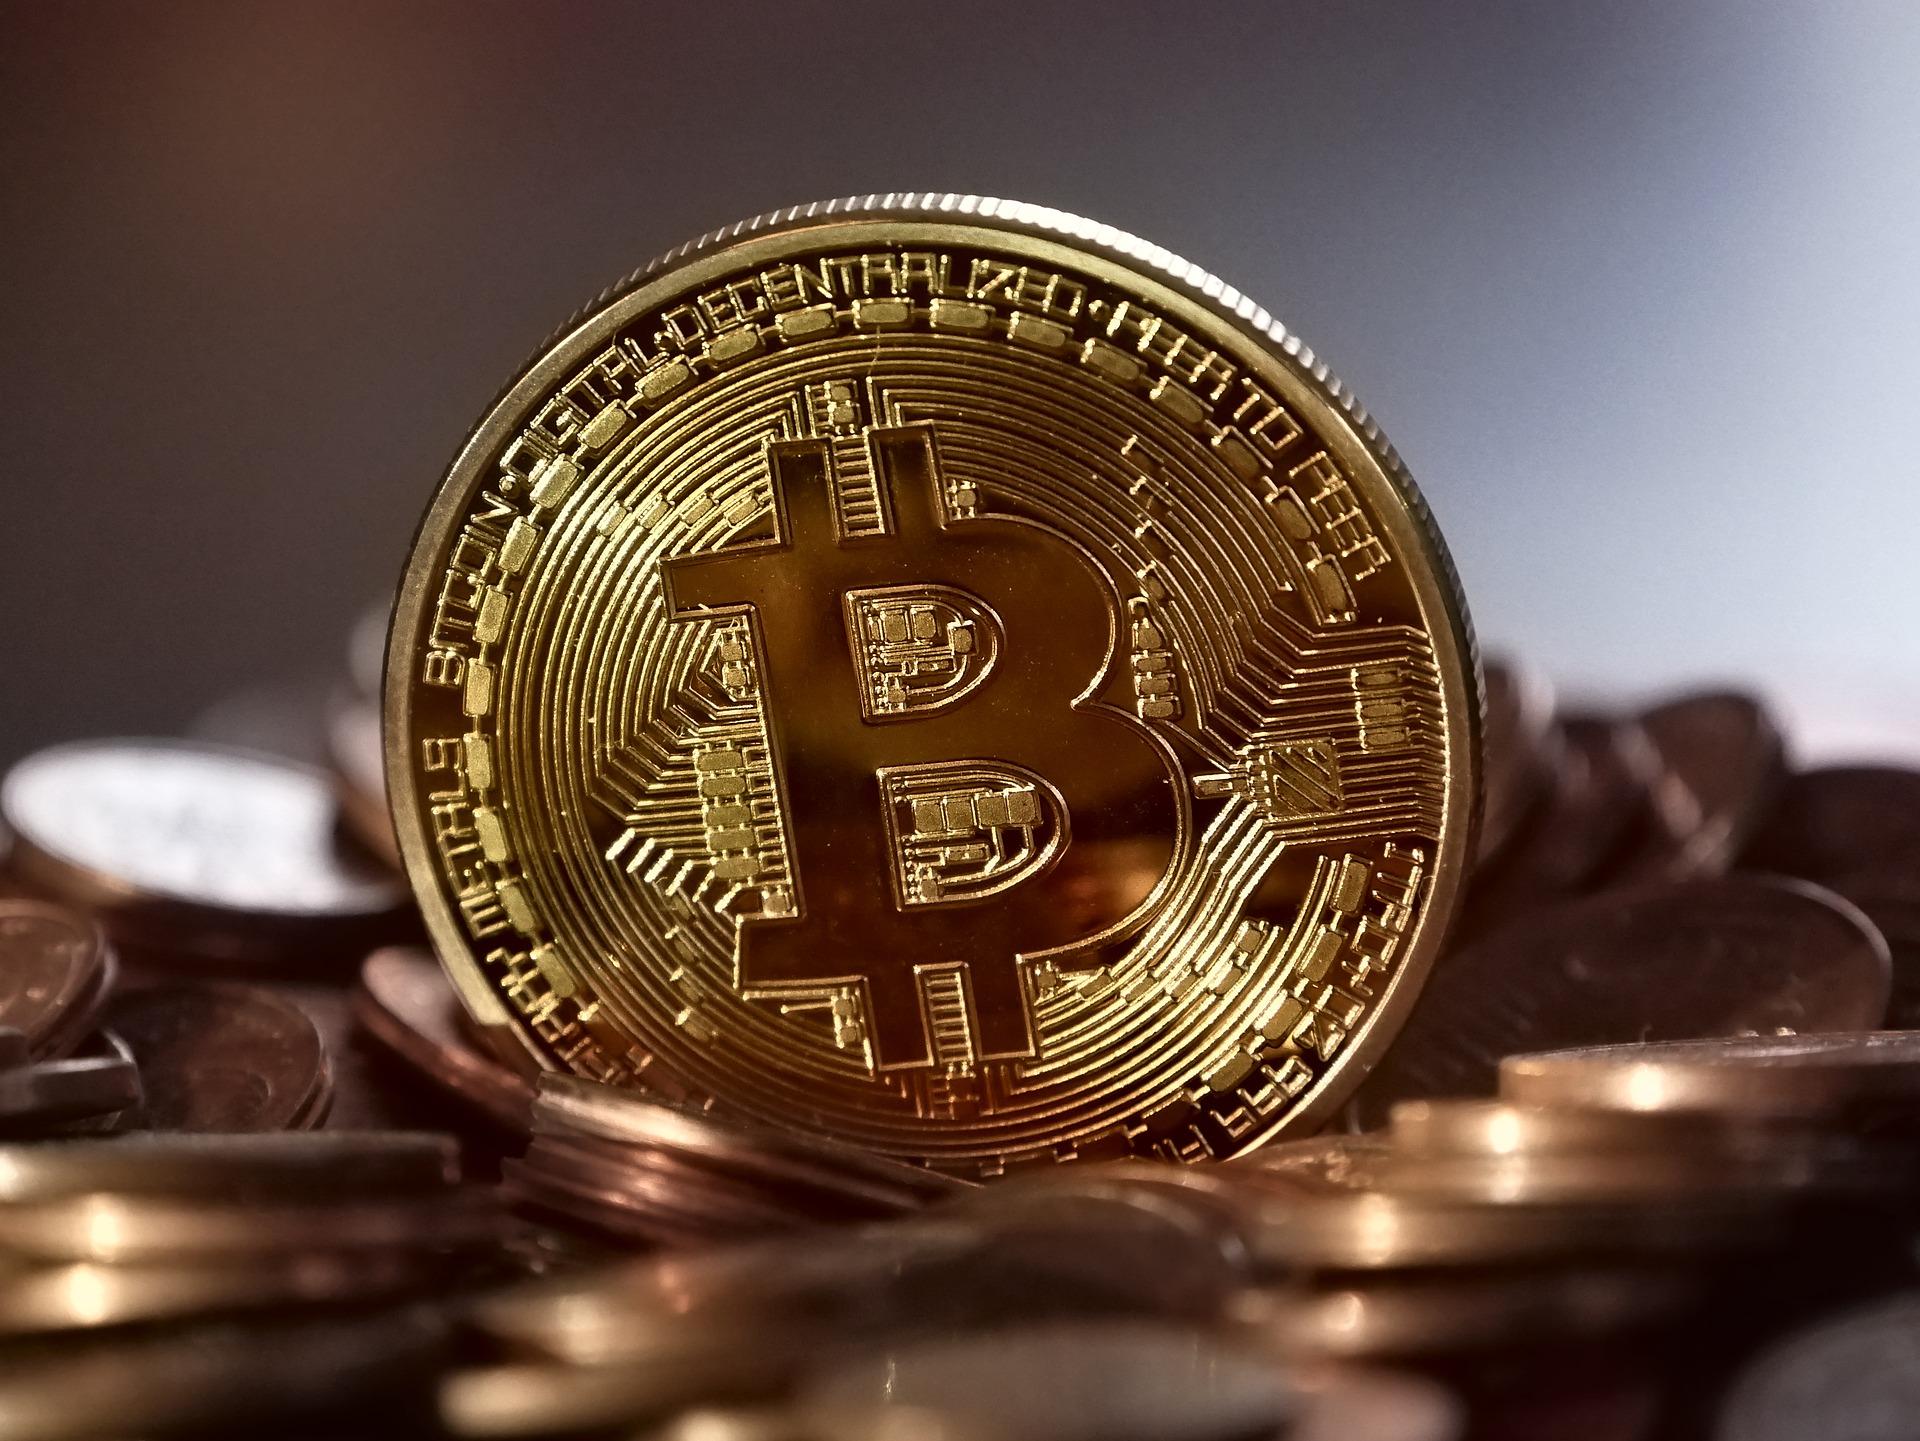 Bitcoin is hitting nearly $20,000